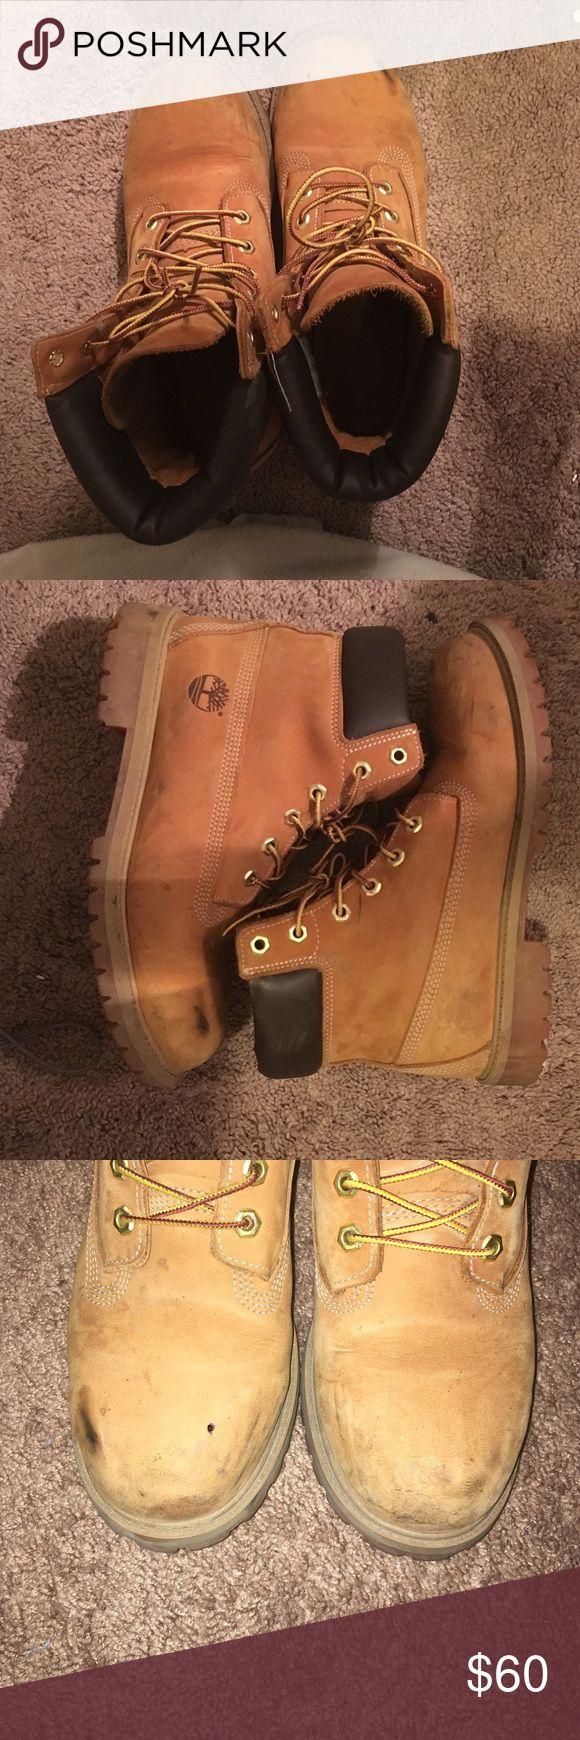 Timberland Boots Fairly worn timberland boots size 7M (women's 9) Timberland Shoes Winter & Rain Boots